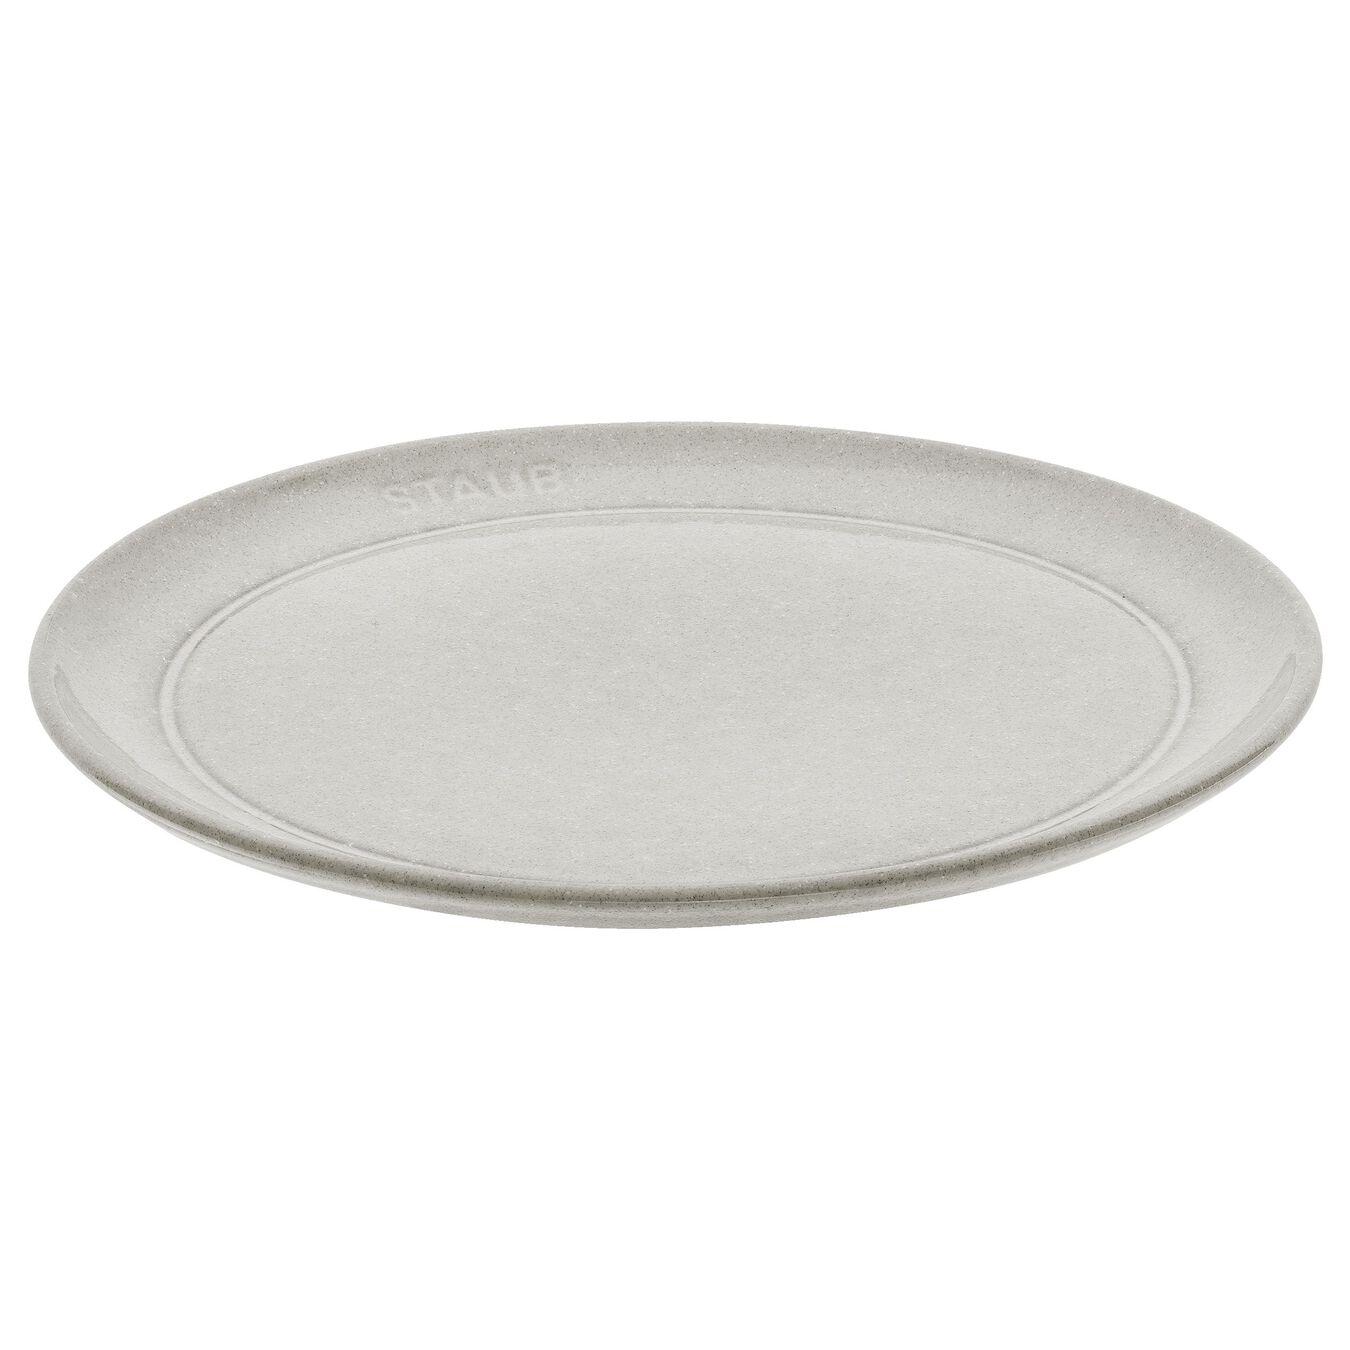 20 cm Ceramic round Plate flat, White Truffle,,large 1